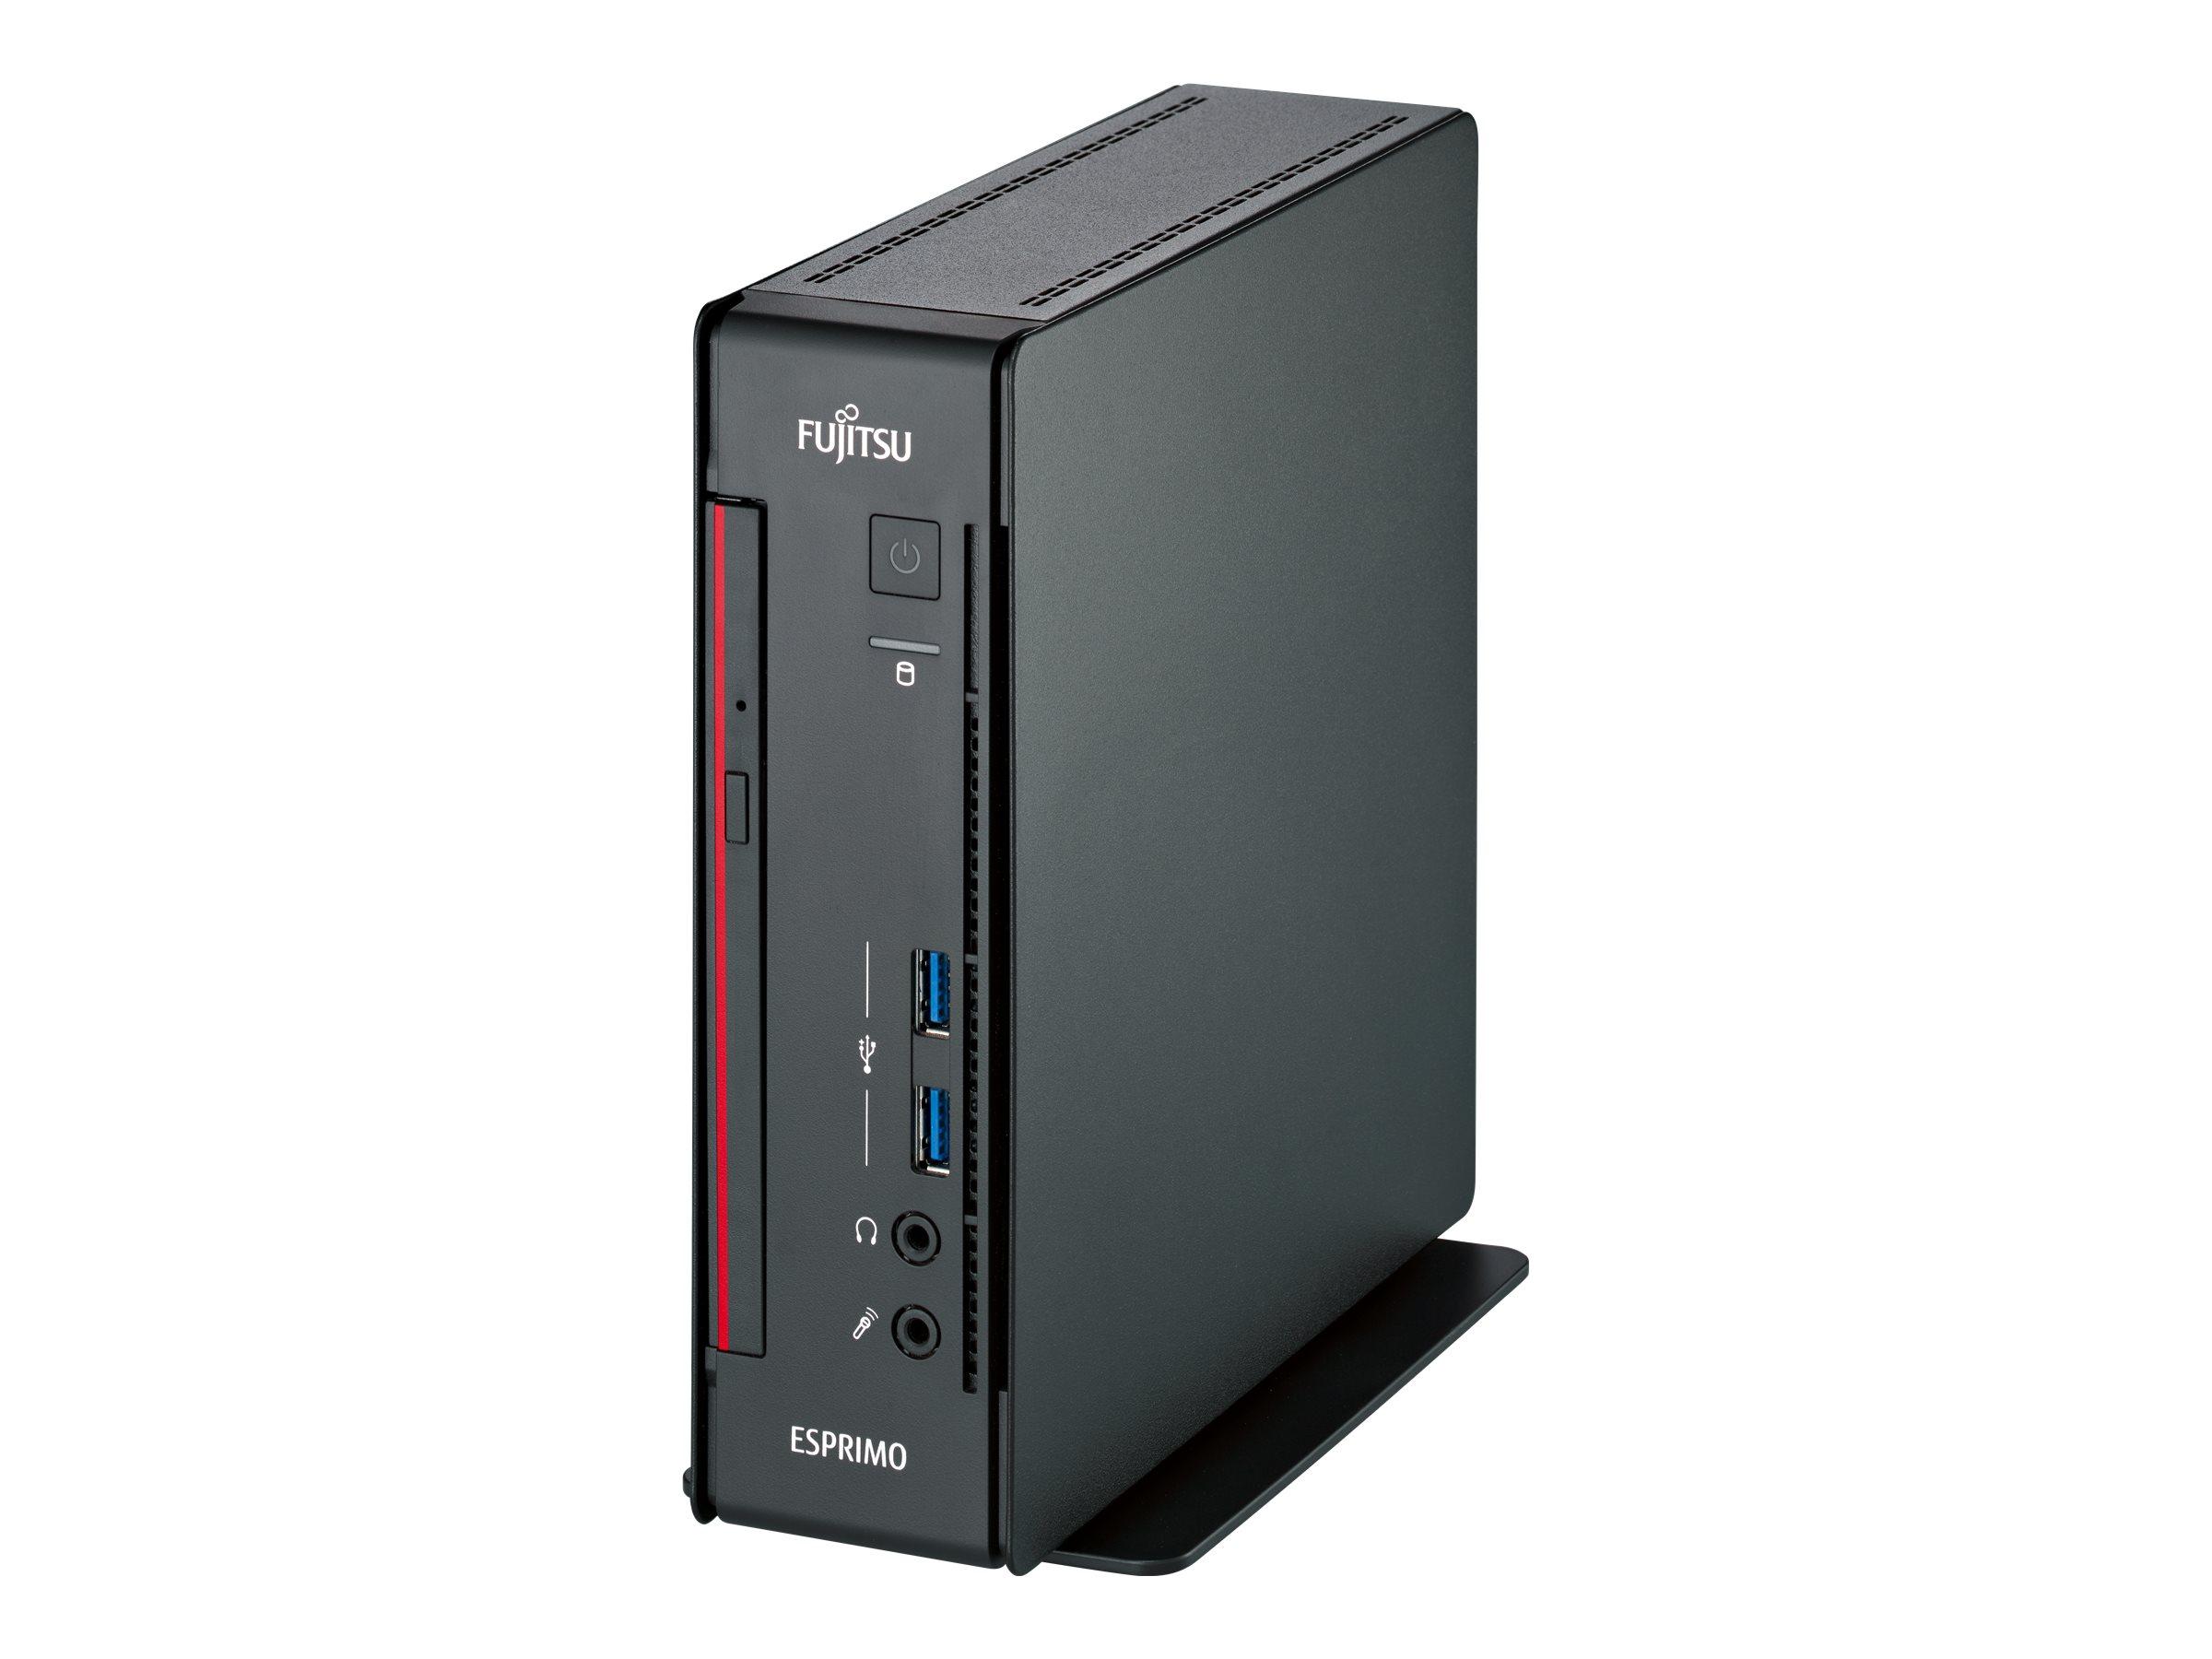 Fujitsu ESPRIMO Q958 - Mini-PC - Core i7 9700T / 2 GHz - RAM 16 GB - SSD 512 GB - NVMe